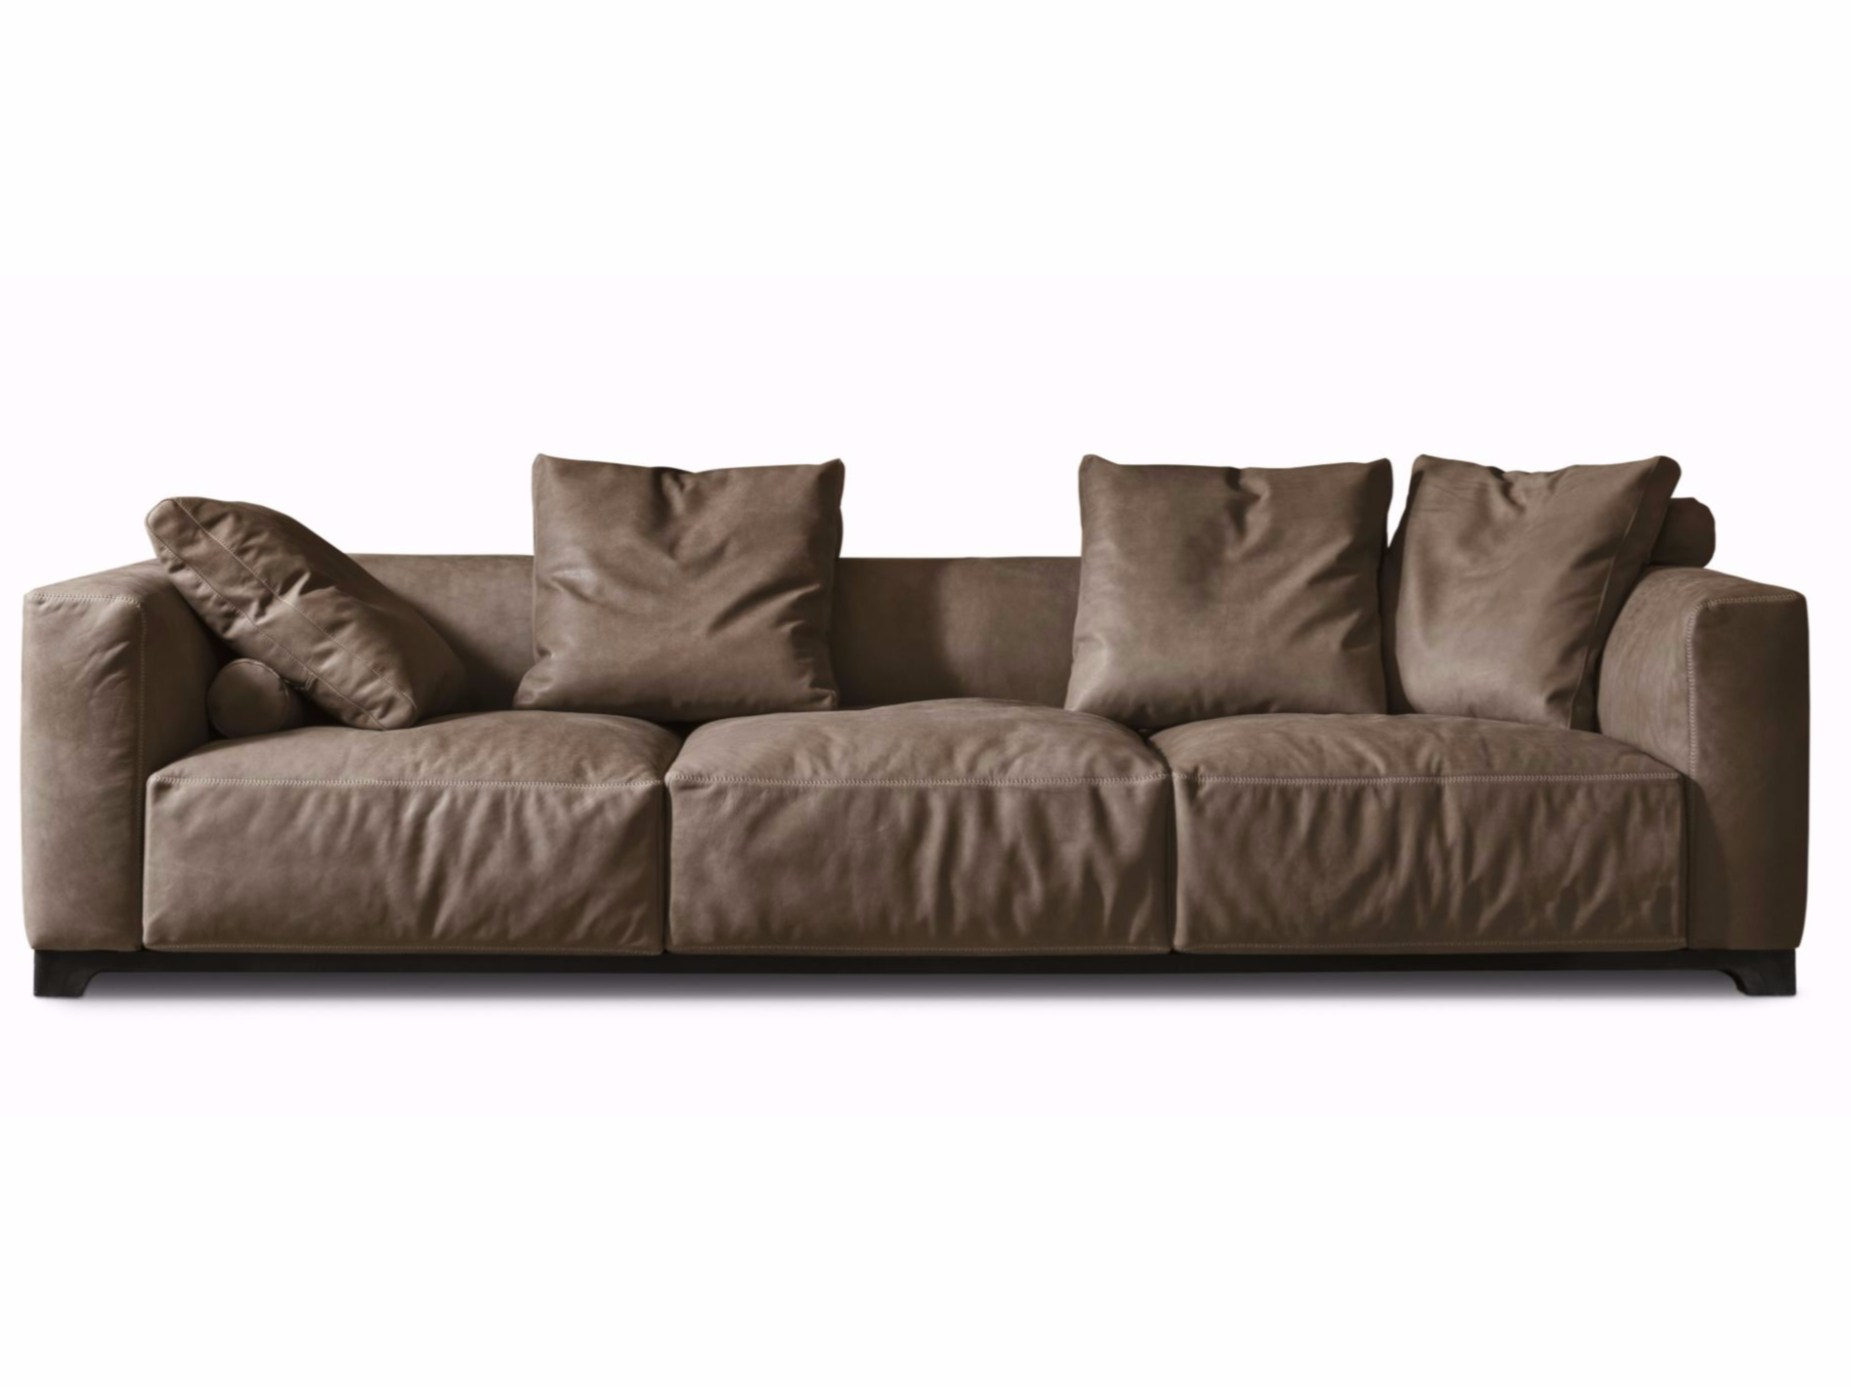 Leather sofa LAND By ALIVAR design Giuseppe Bavuso